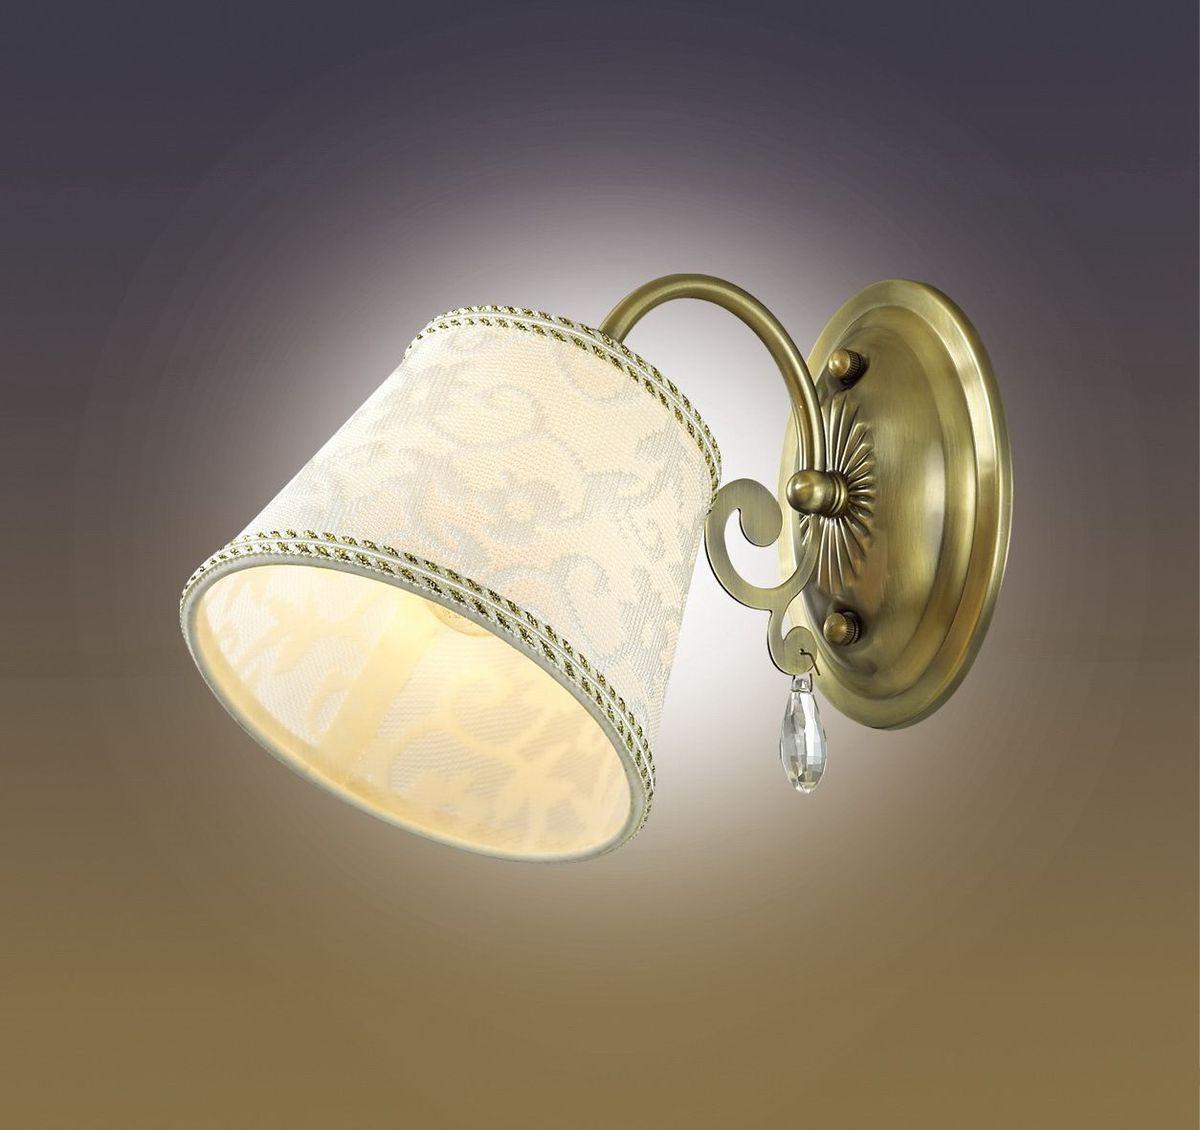 Бра Odeon Light Solera, 1 х E14, 40W. 2915/1W2915/1W